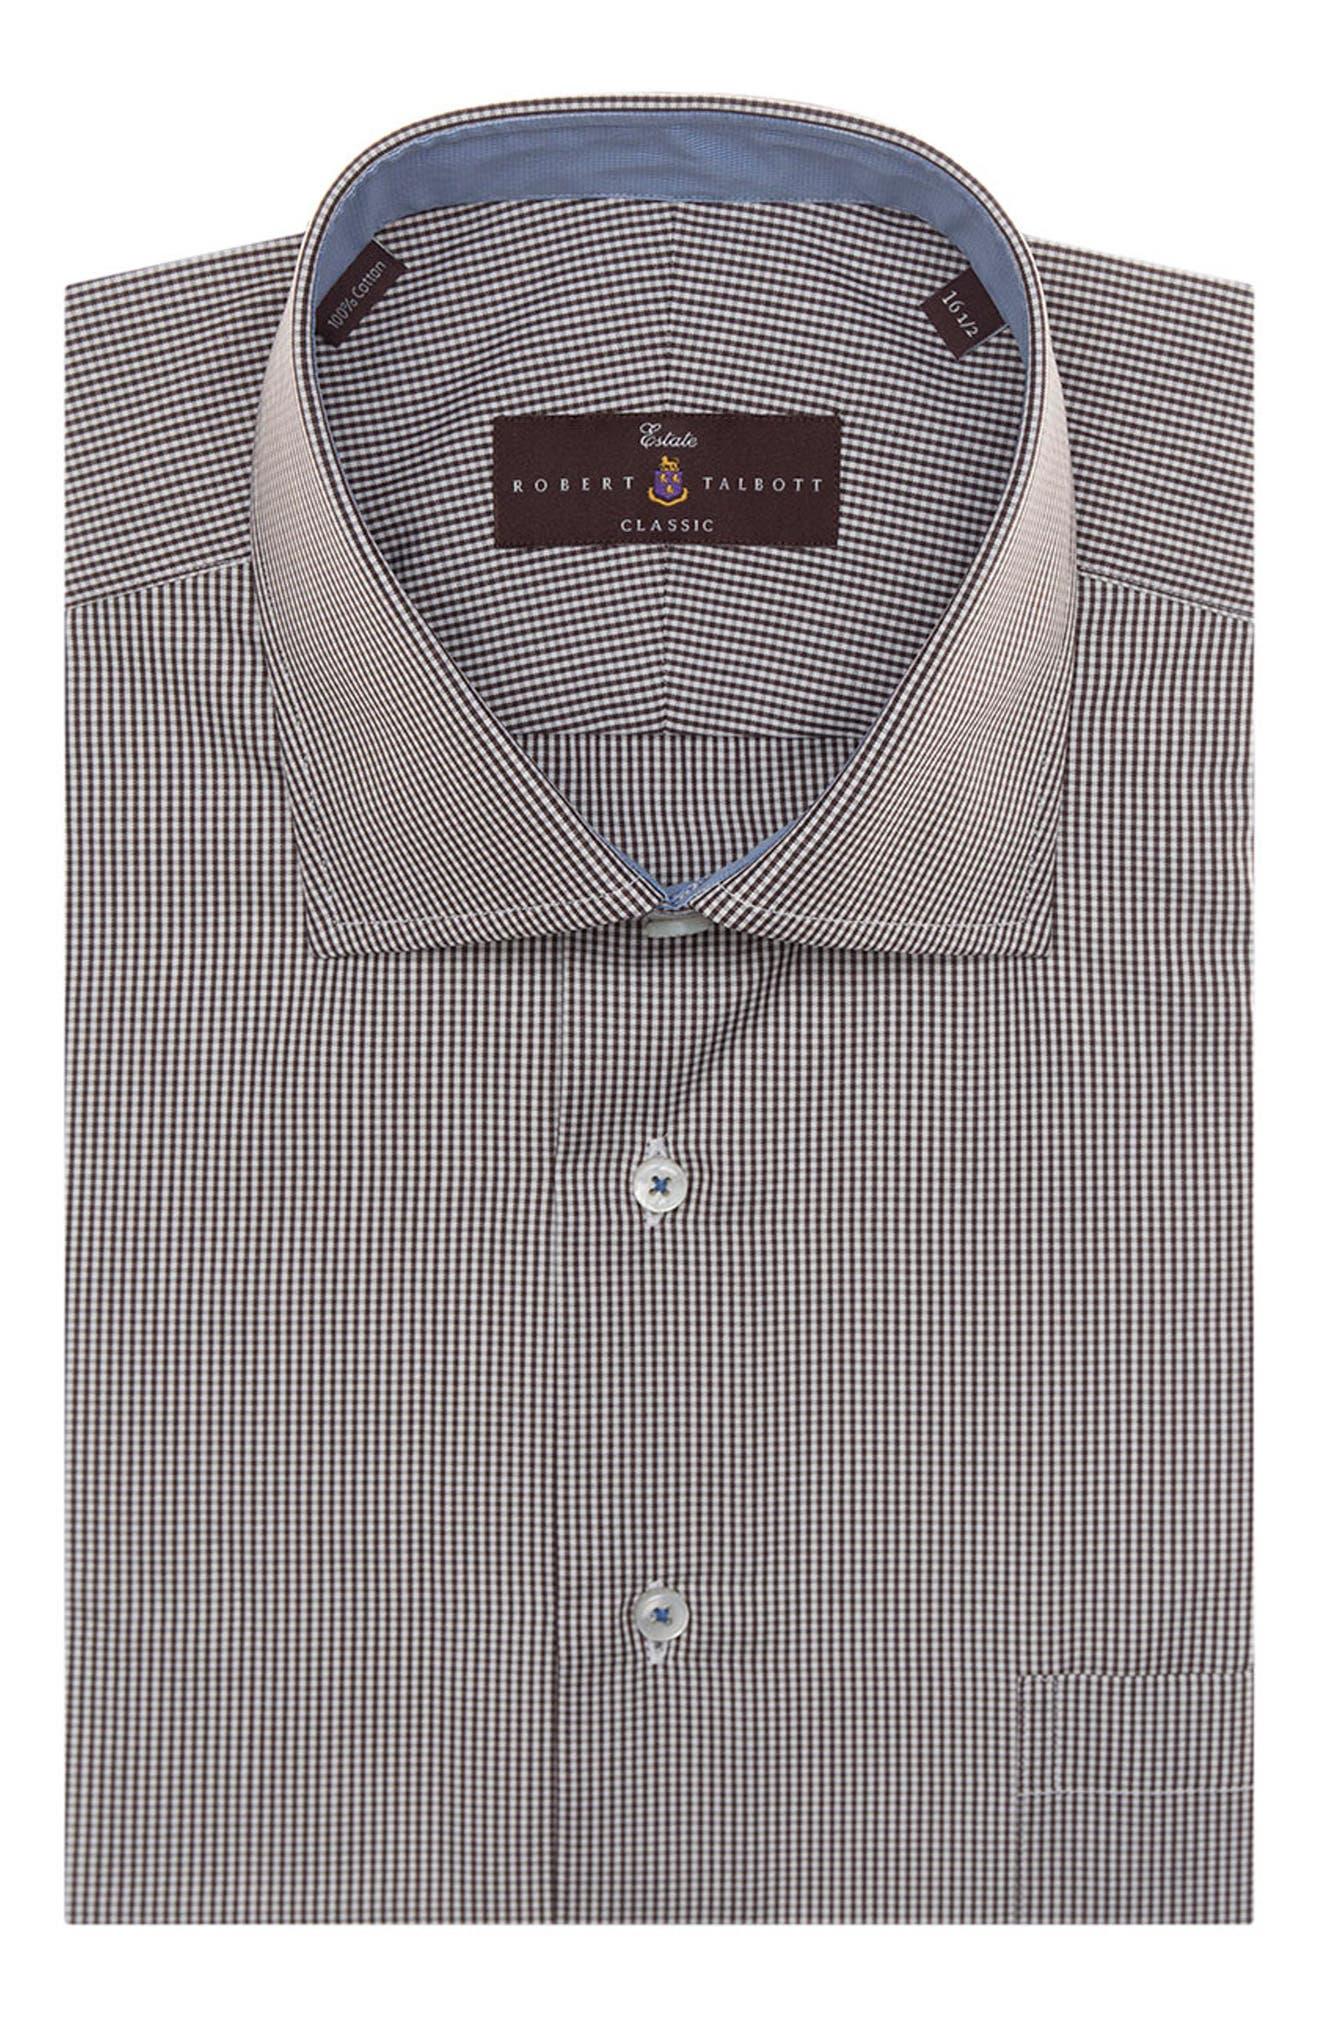 Alternate Image 1 Selected - Robert Talbott Tailored Fit Check Dress Shirt